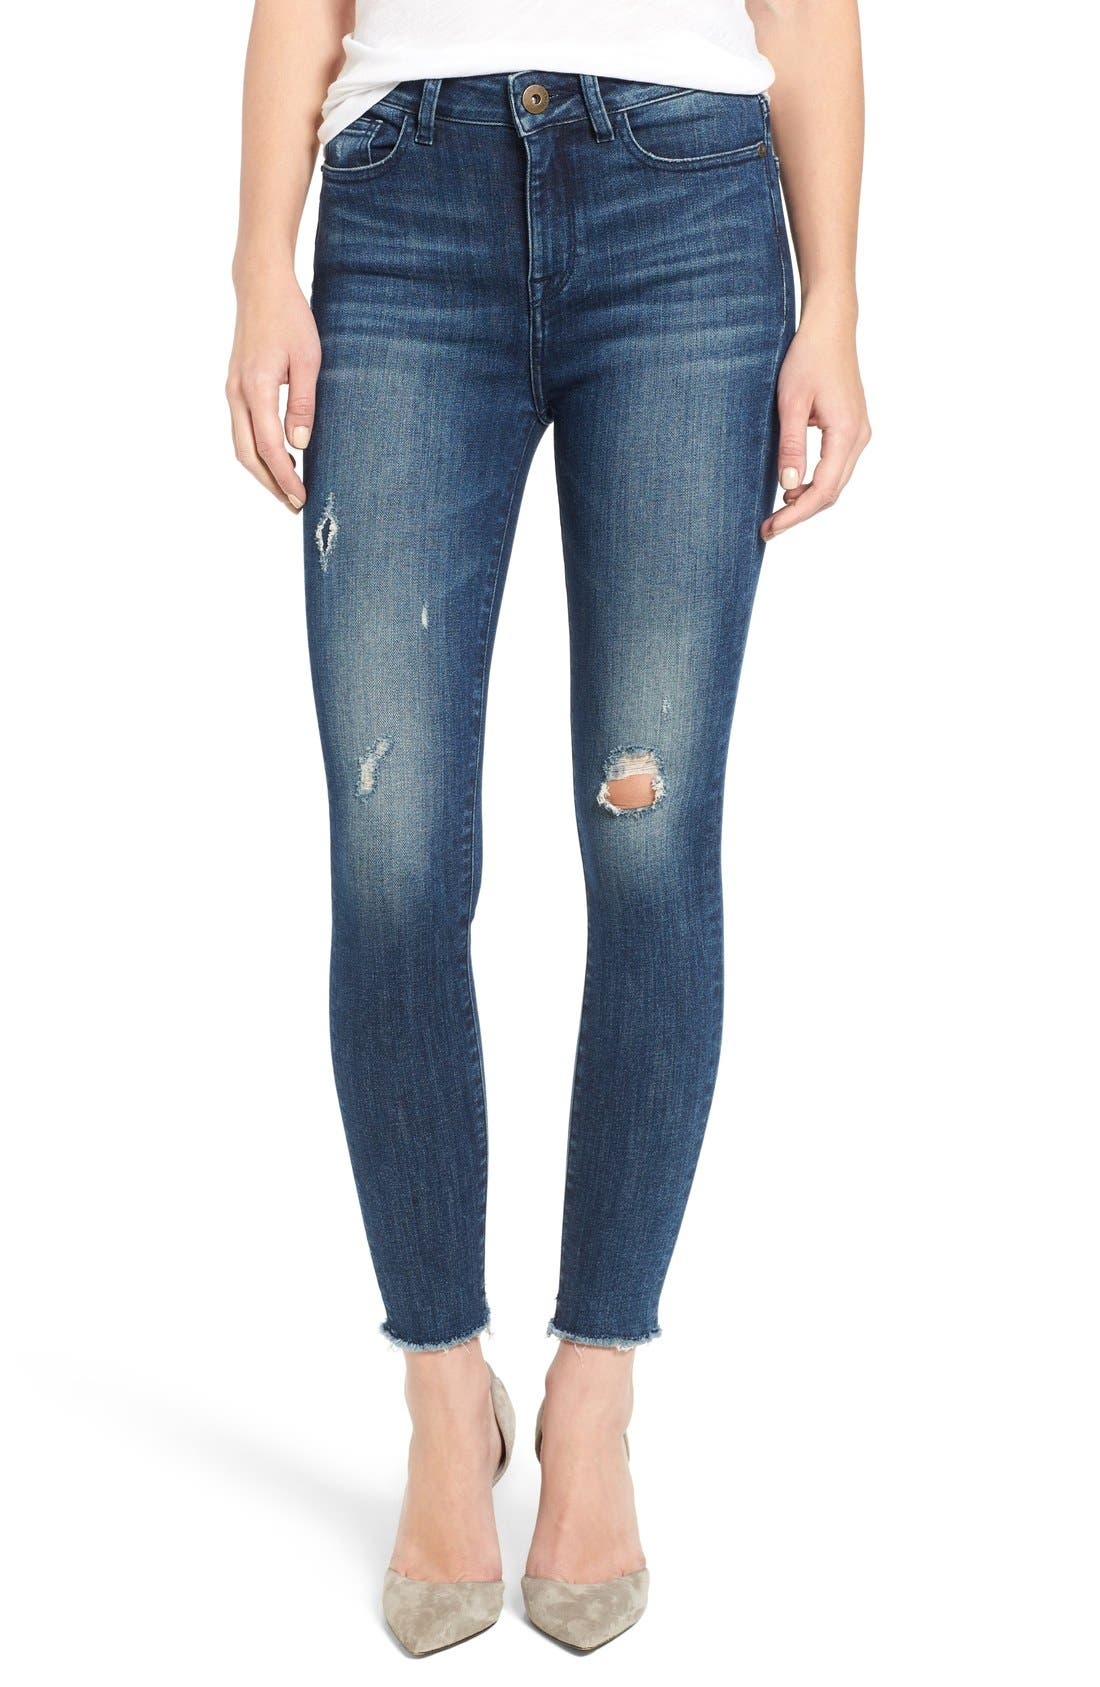 Petite Modern Frayed Skinny Jeans in Dark Indigo Wash. $ Quick Shop. Petite Curvy Double Frayed Soft Slim Pocket Skinny Jeans in Black. $ Quick Shop. Best Seller. Petite Modern Skinny Jeans in Black. $ Quick Shop. Best Seller. Petite Curvy Skinny Jeans in Black. .